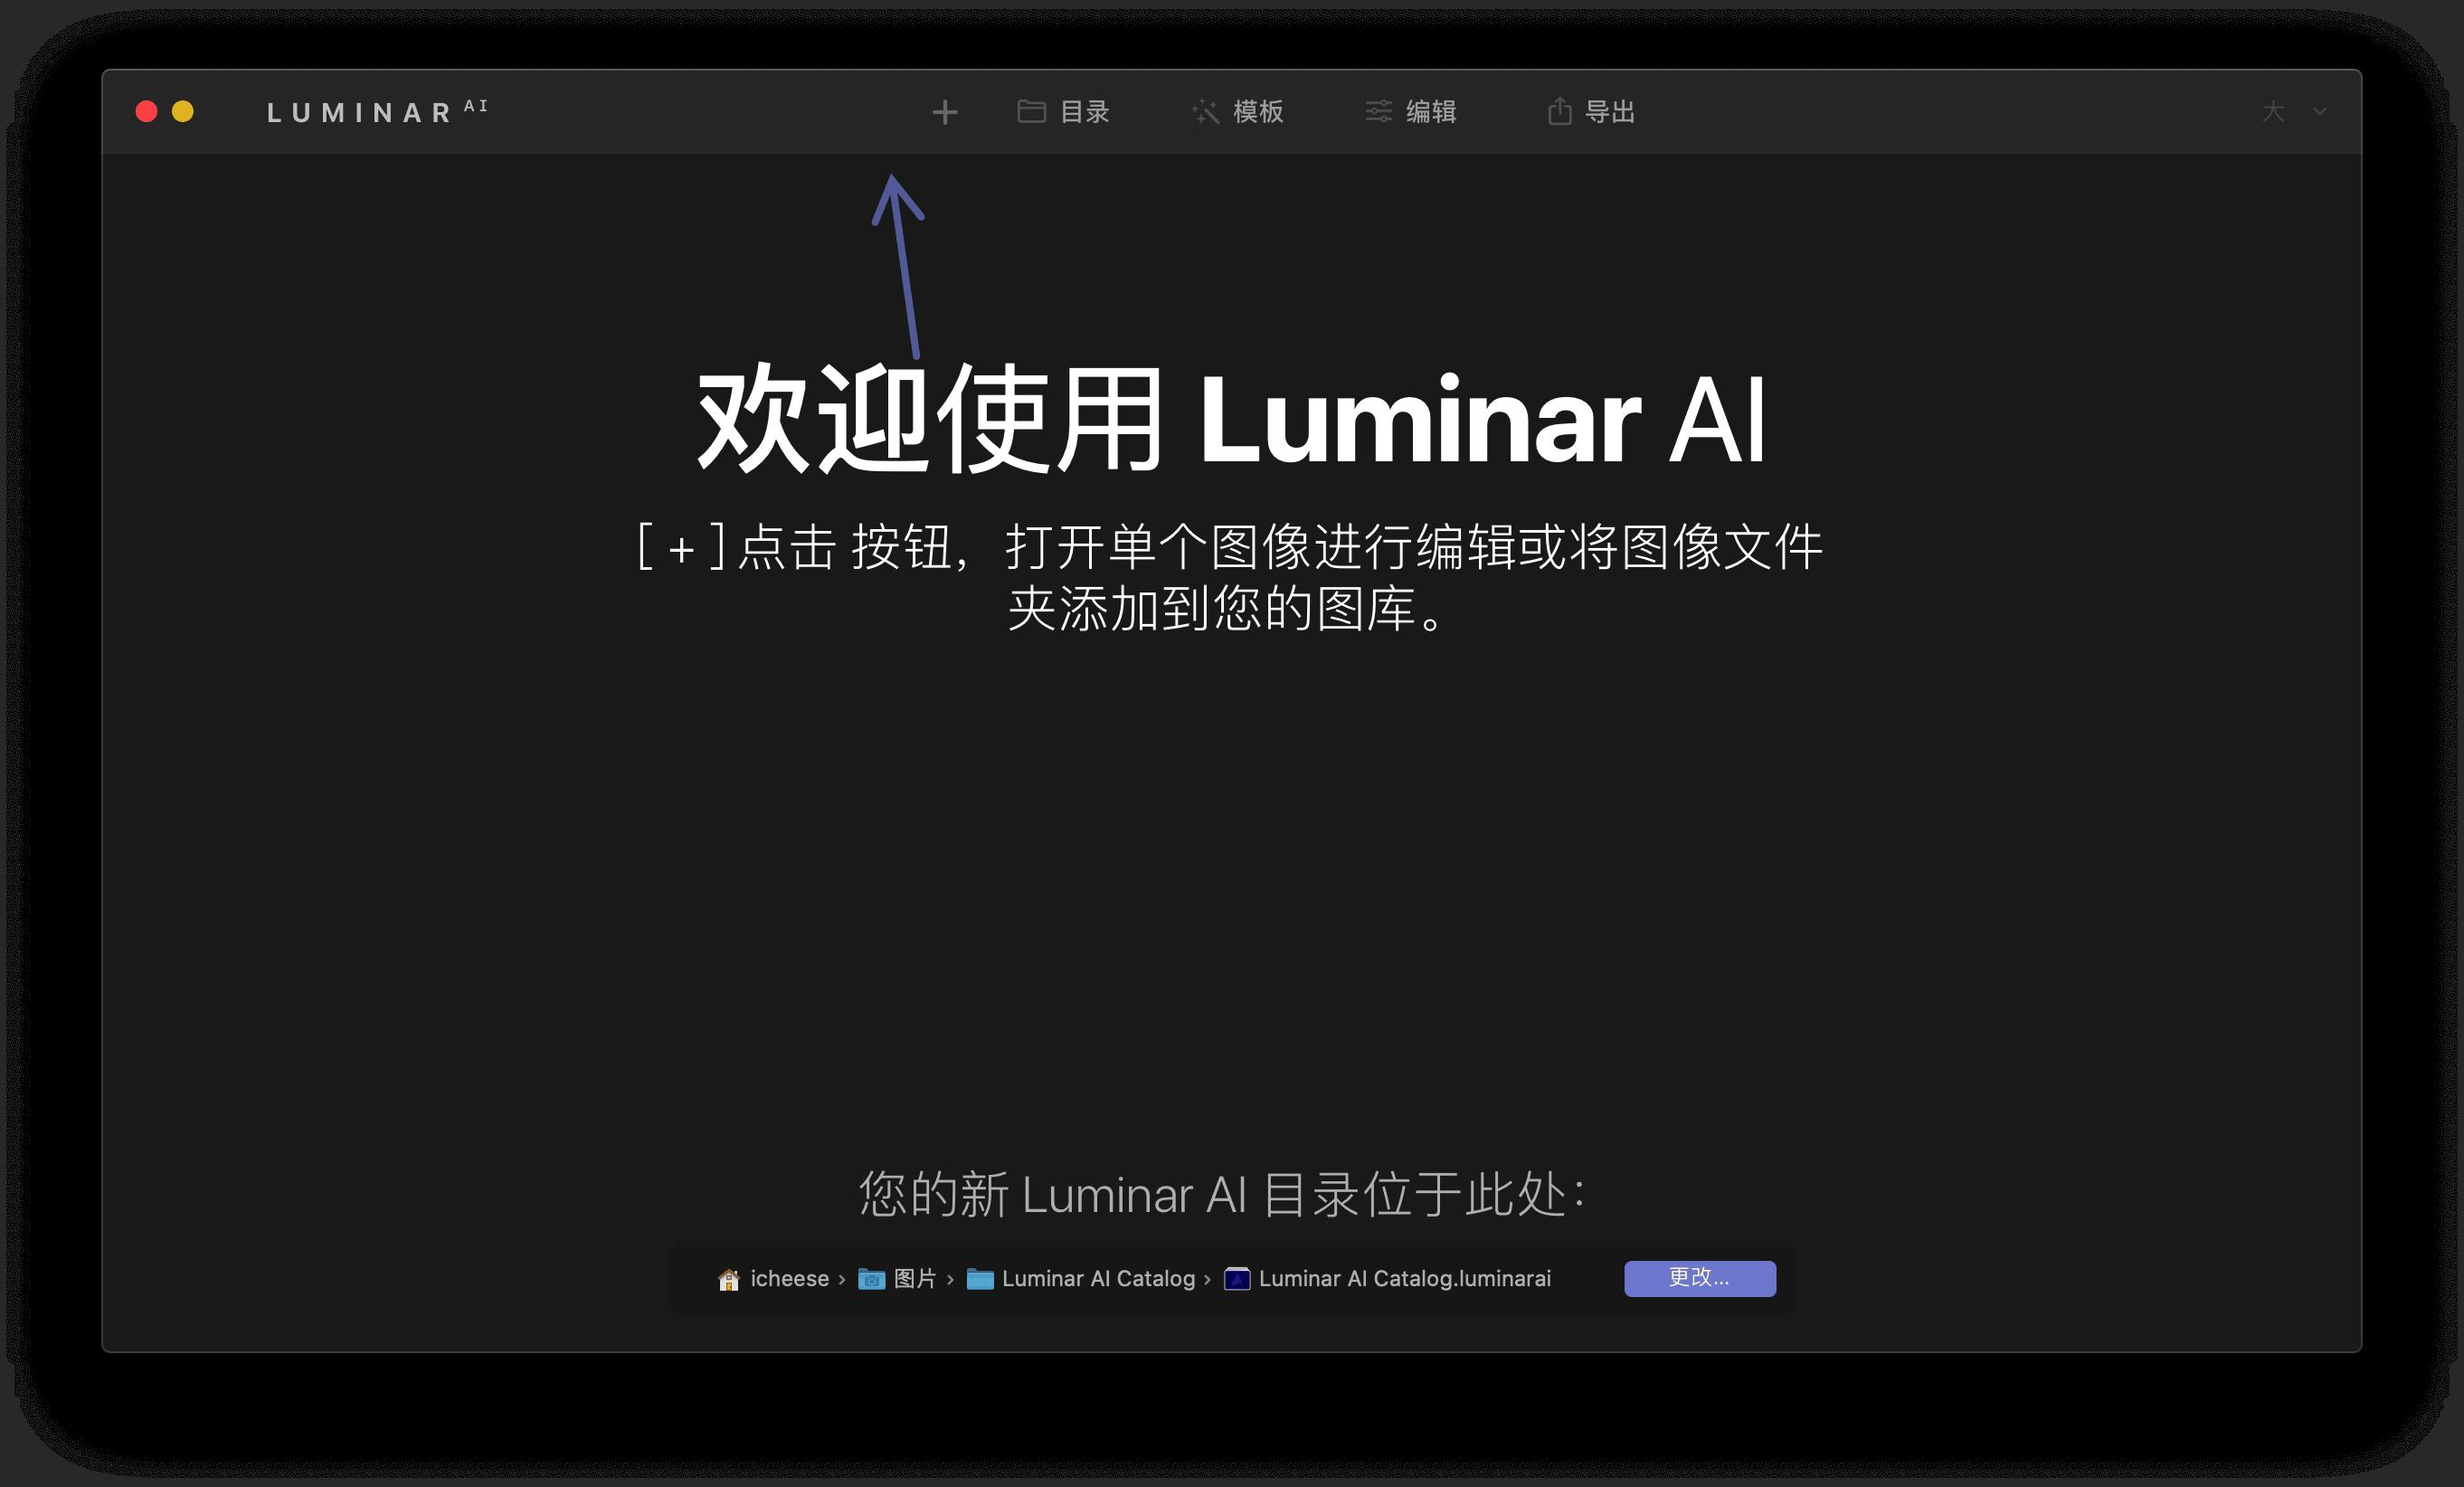 Luminar AI 1.0.0 (8388) 中文破解版  超赞的AI照片编辑器  第2张